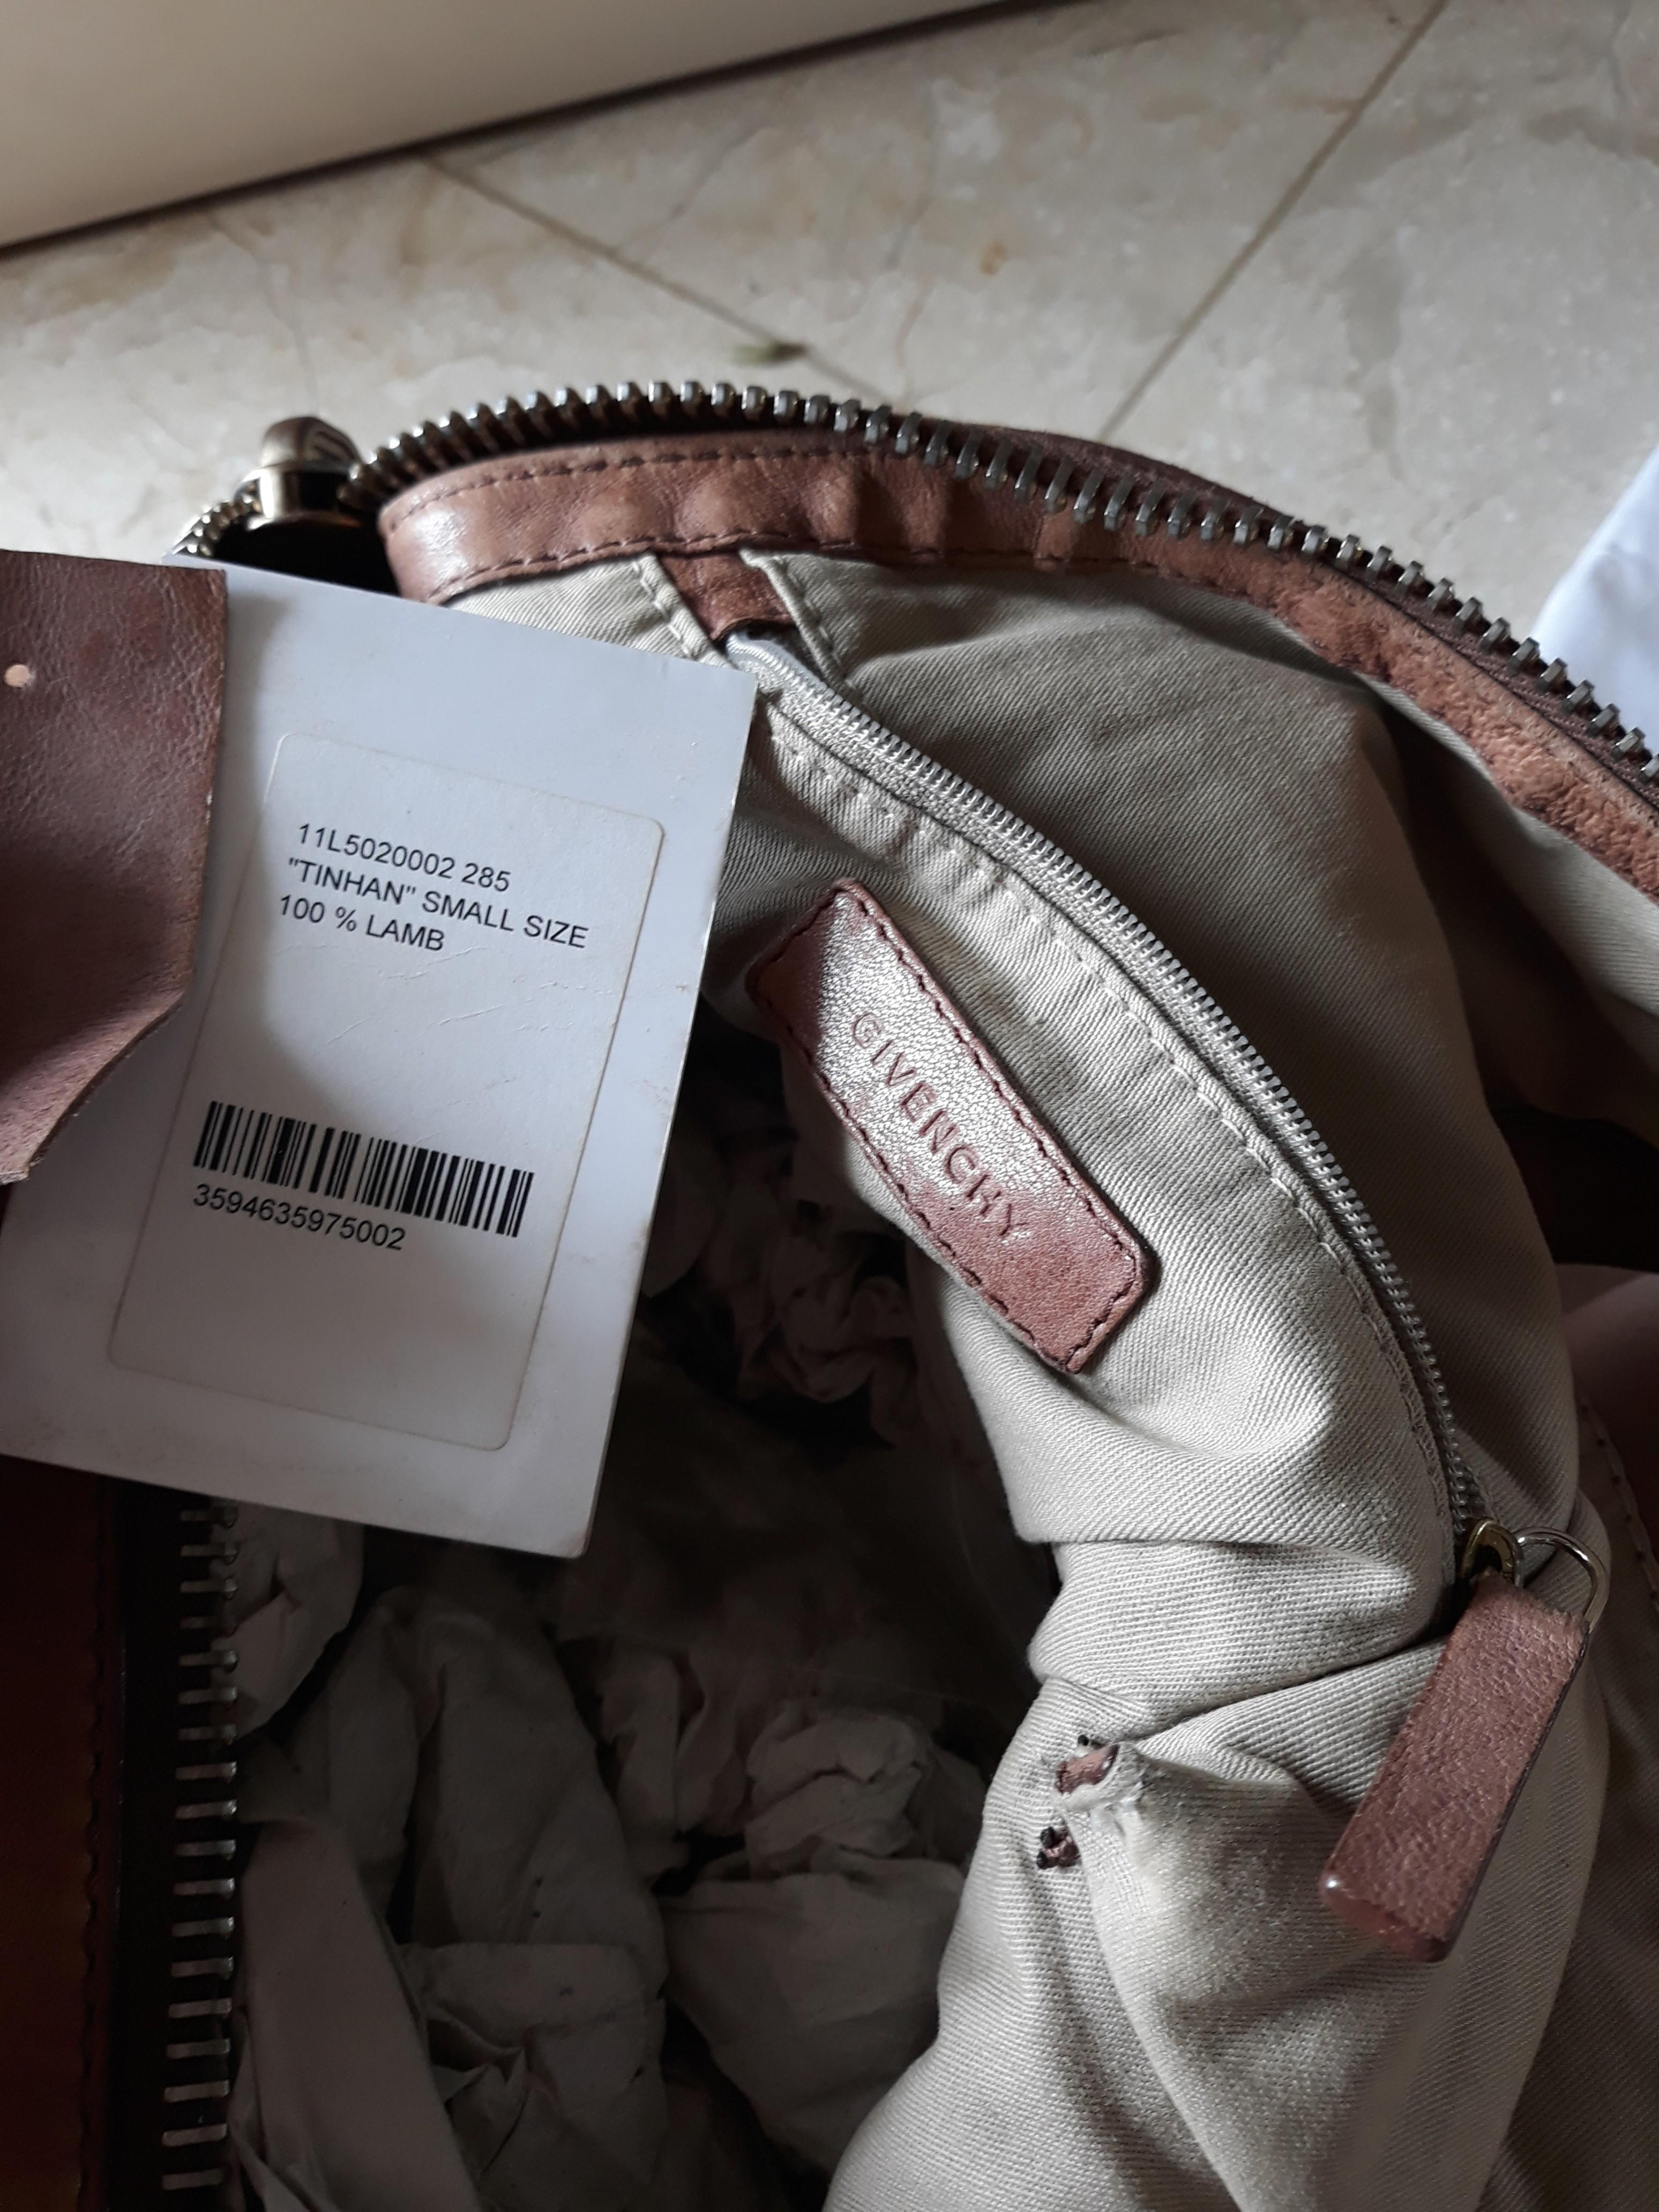 d413df96f0 Givenchy Tinhan Bag (authentic)